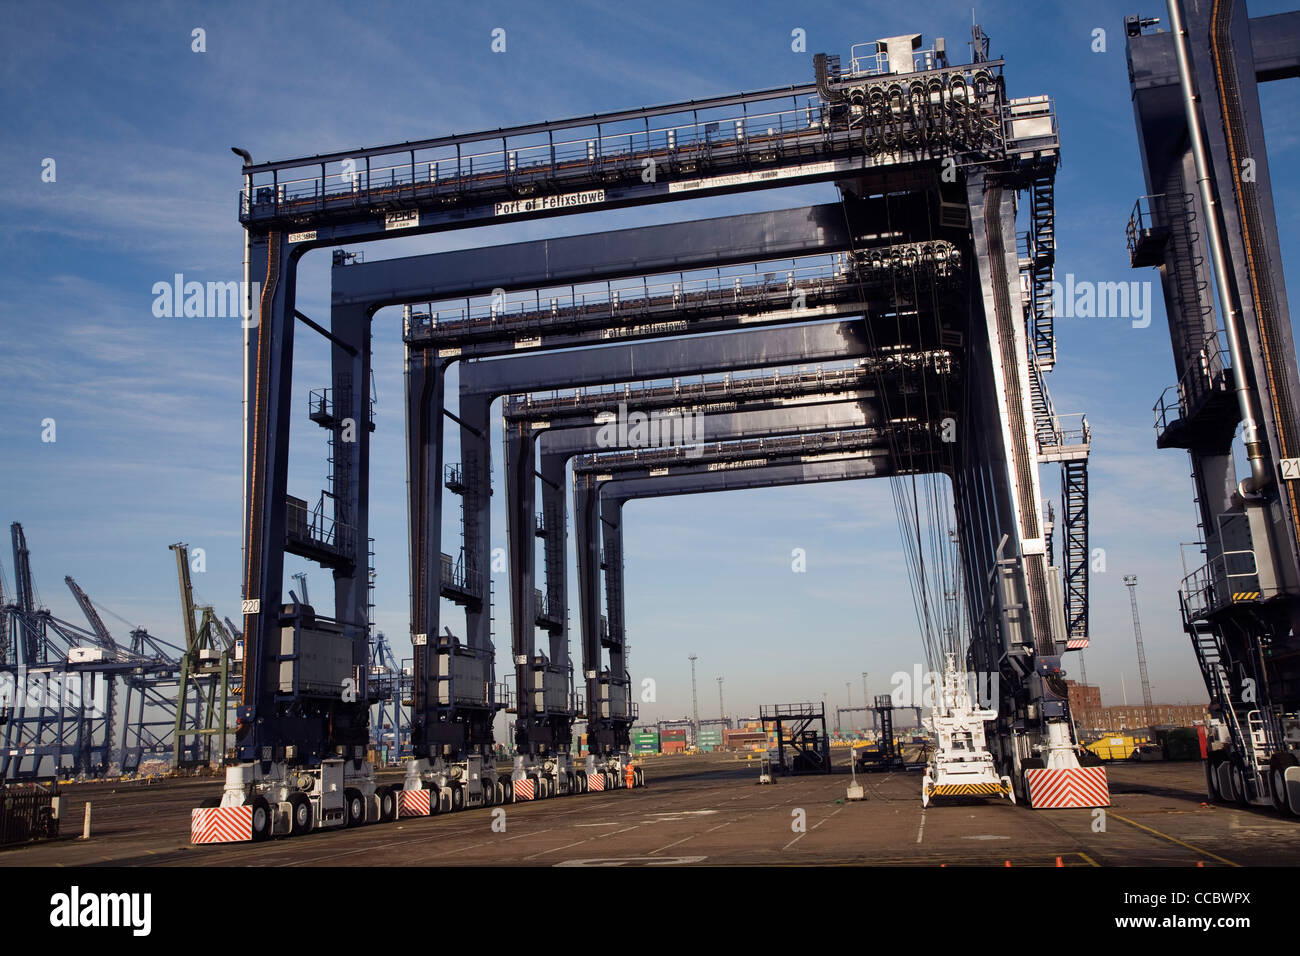 Container spreader crane, Port of Felixstowe, Suffolk, England - Stock Image